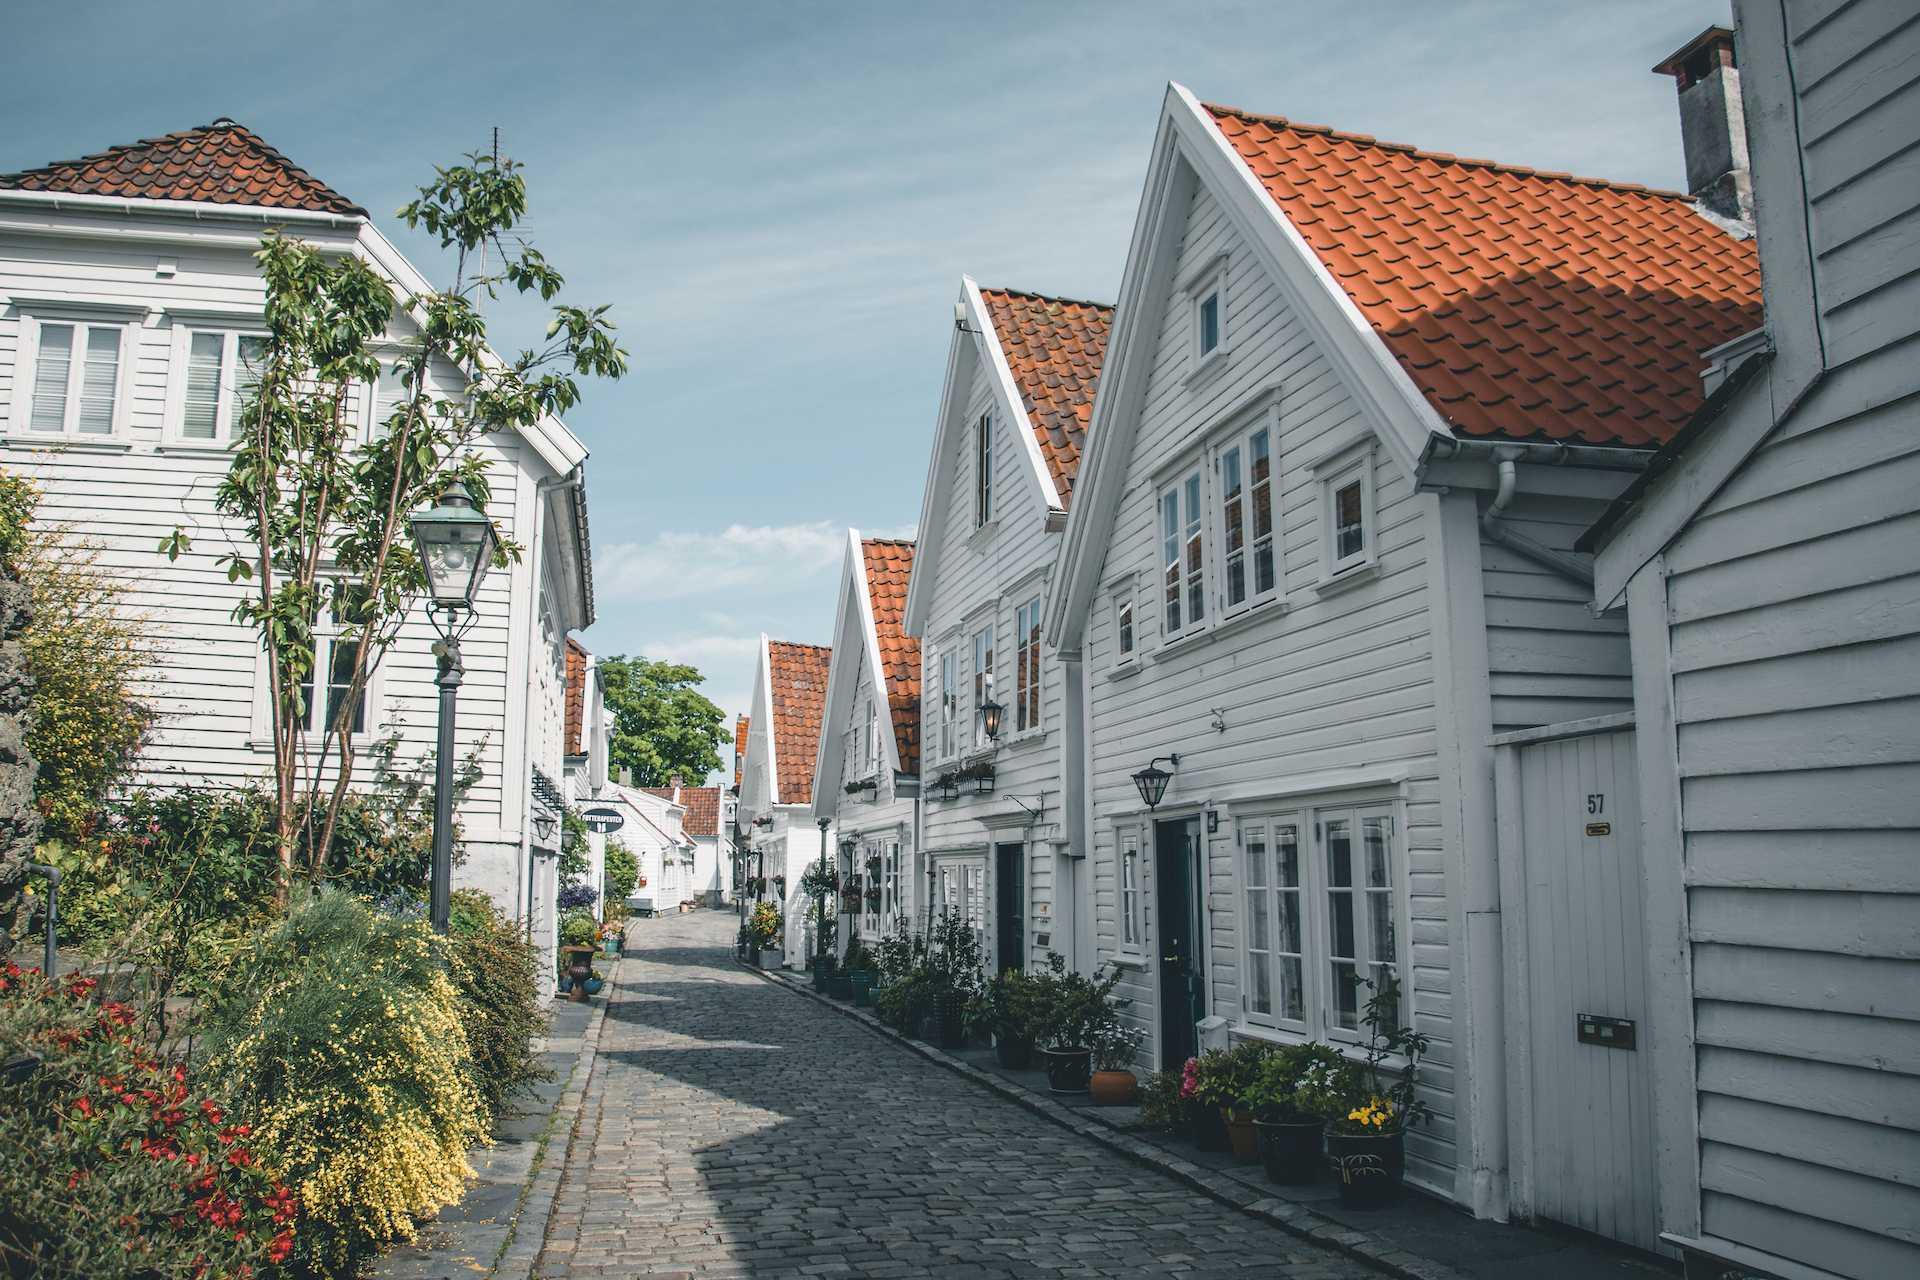 Stare miasto wStavanger